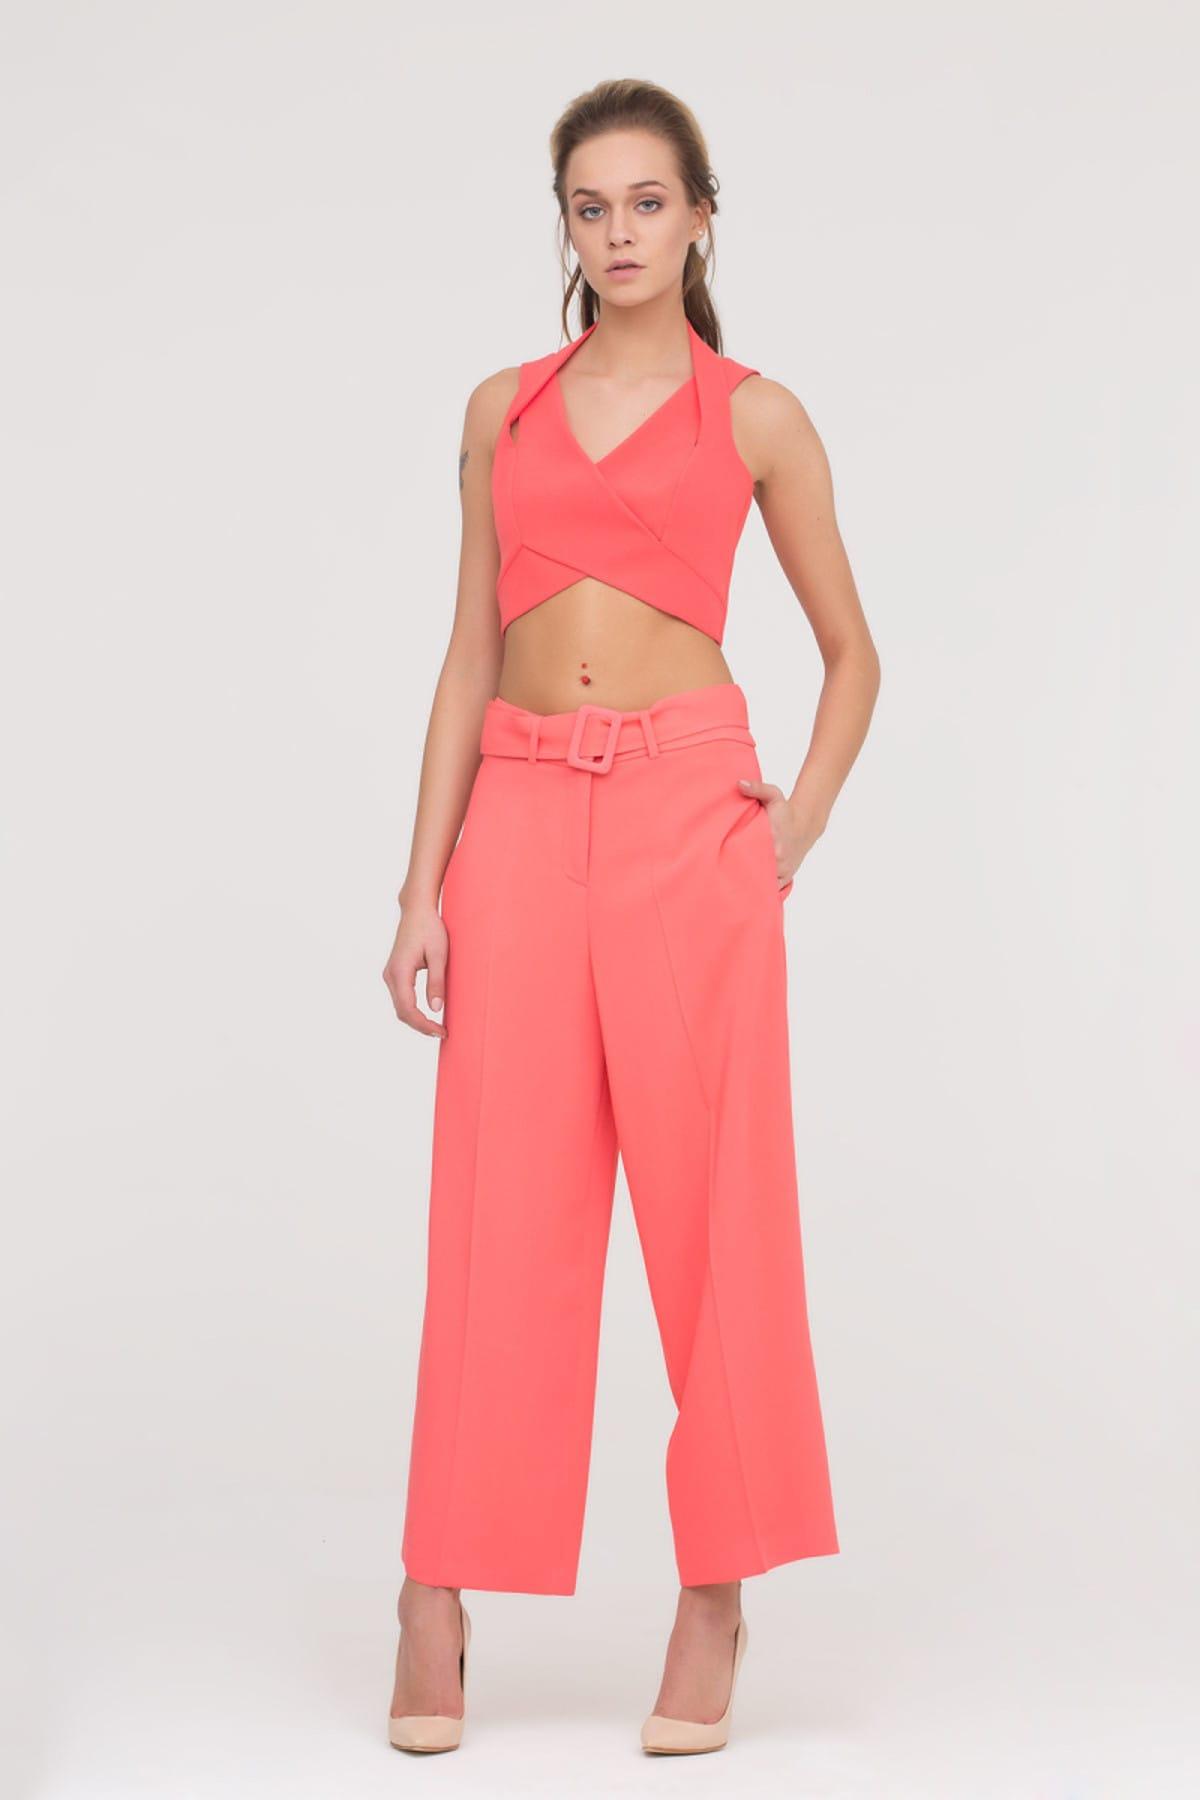 GİZİA Kadın Papaya Rengi Bol Kesim Pantolon M17Y1Y01711TV 1